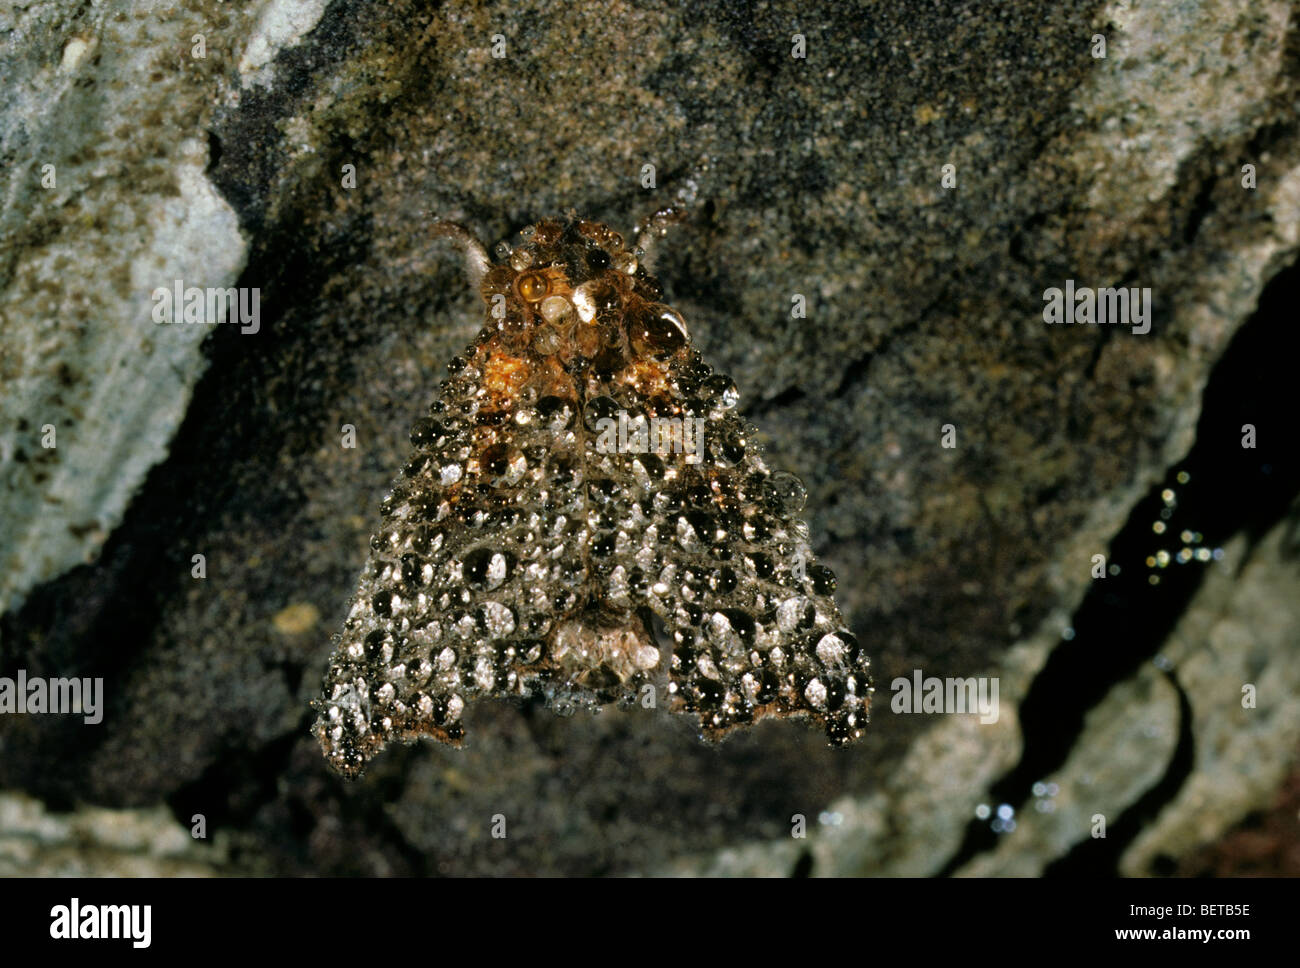 Hibernating herald moth (Scoliopteryx libatrix) covered in dew, Europe - Stock Image